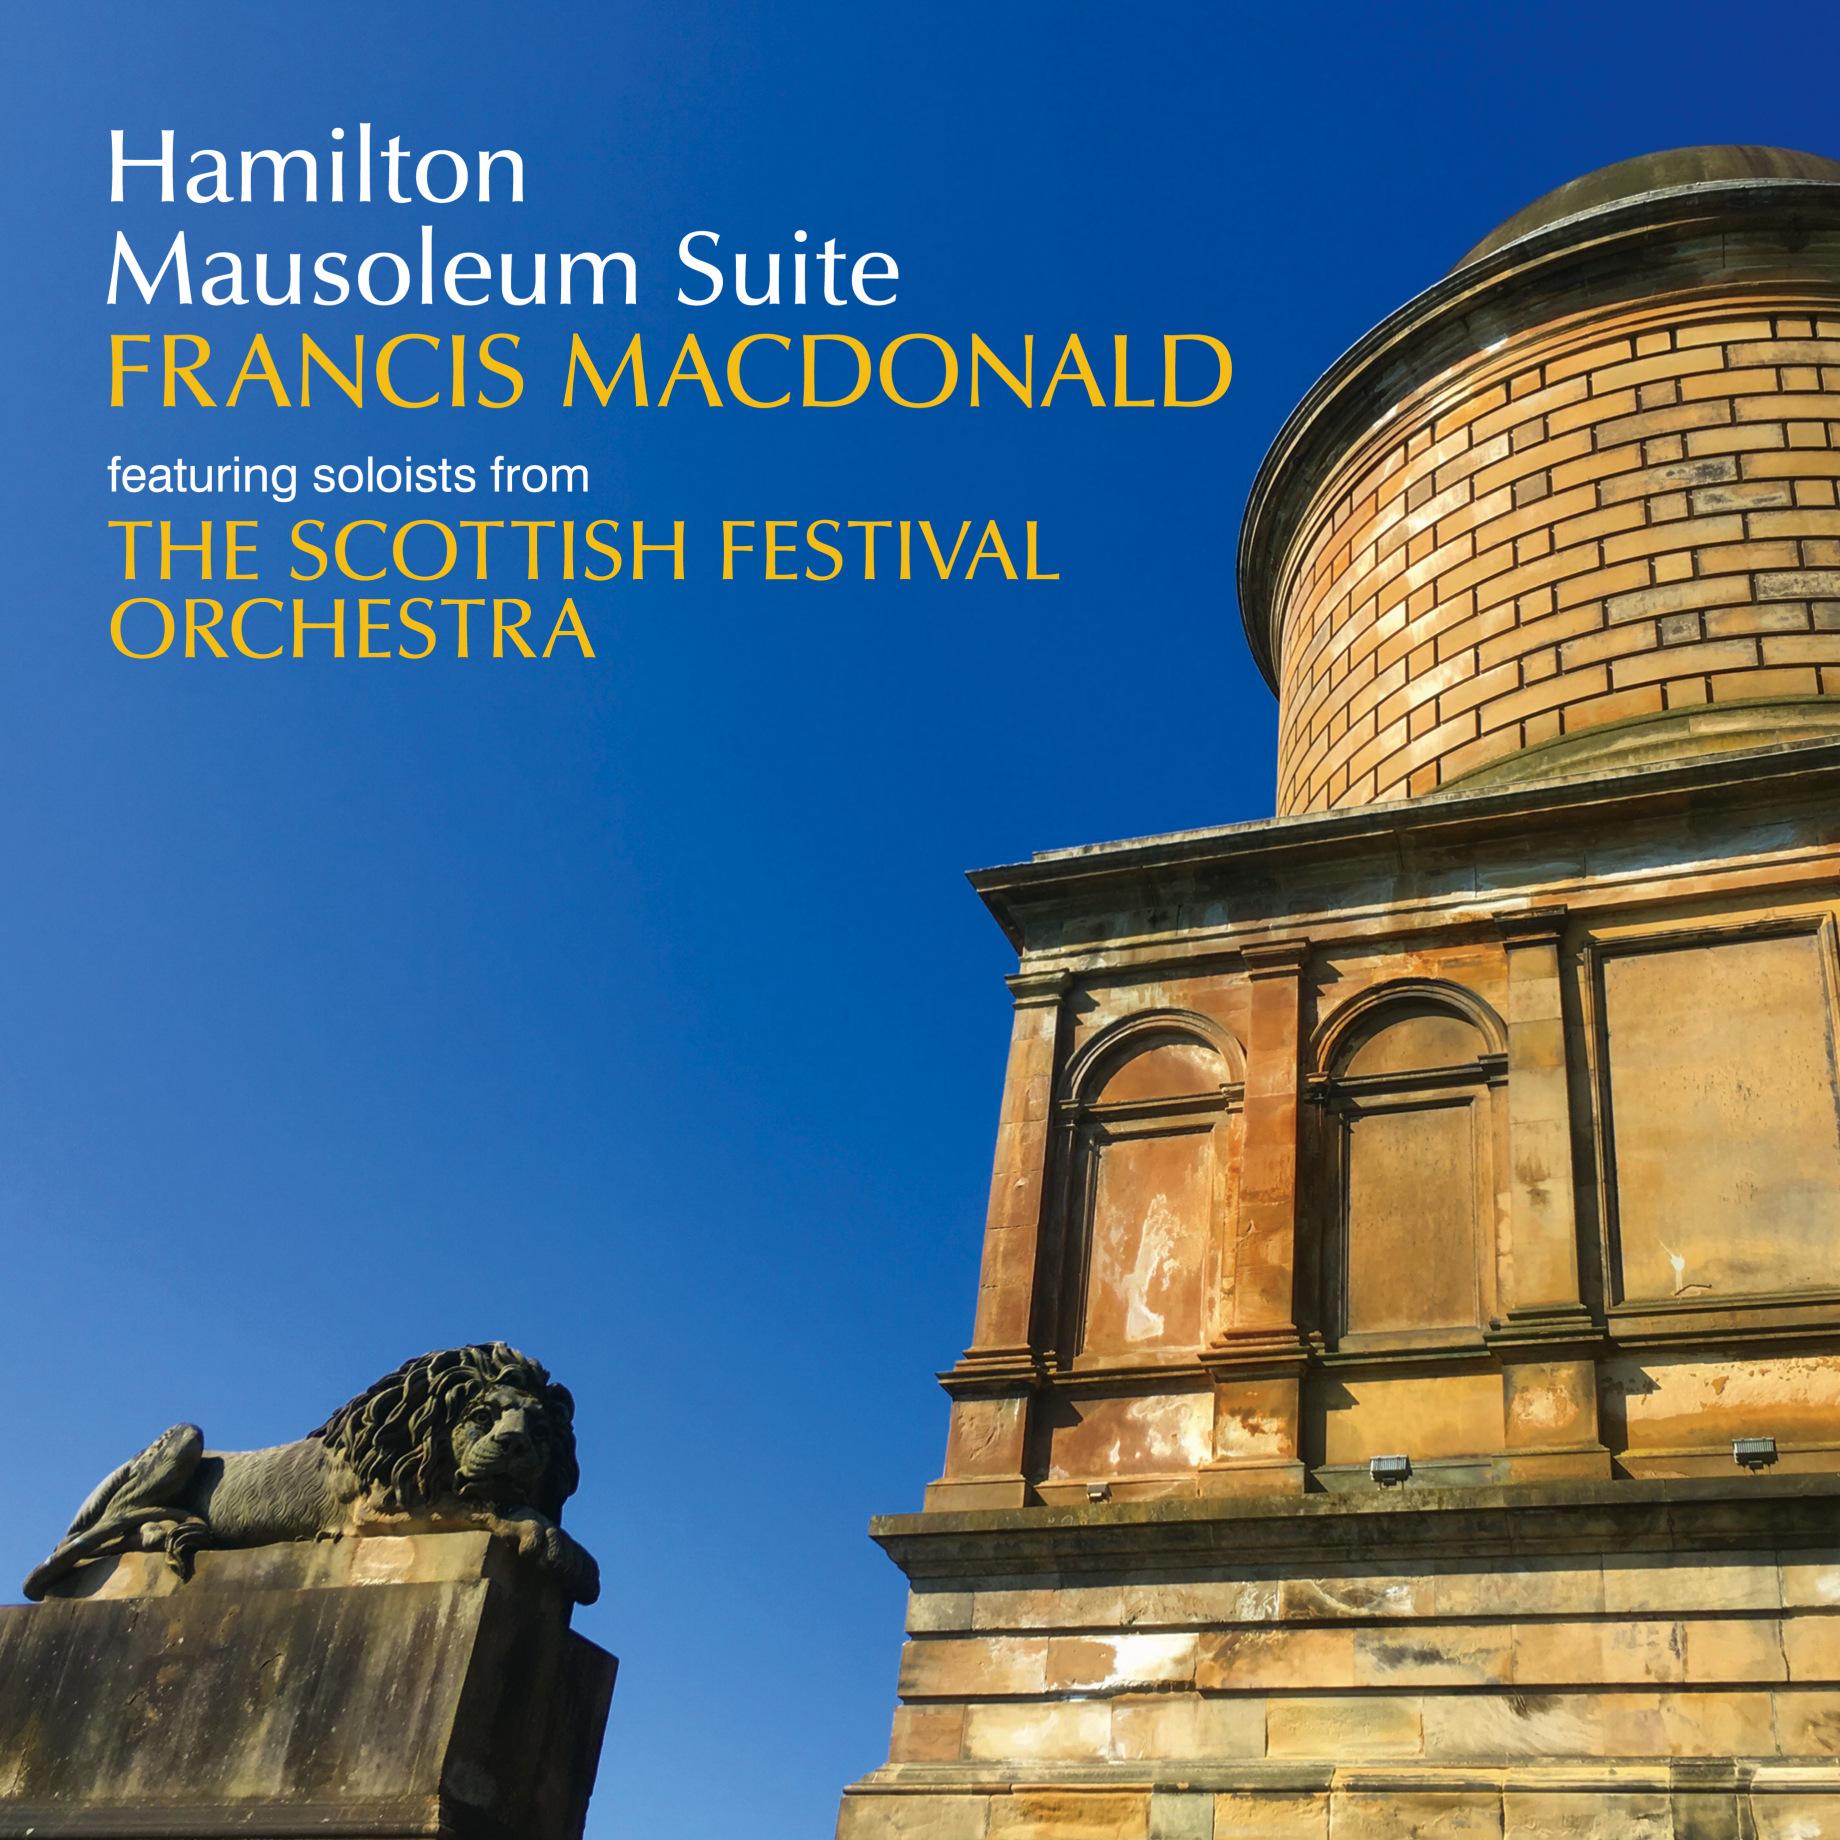 Hamilton Mausoleum with Francis Macdonal